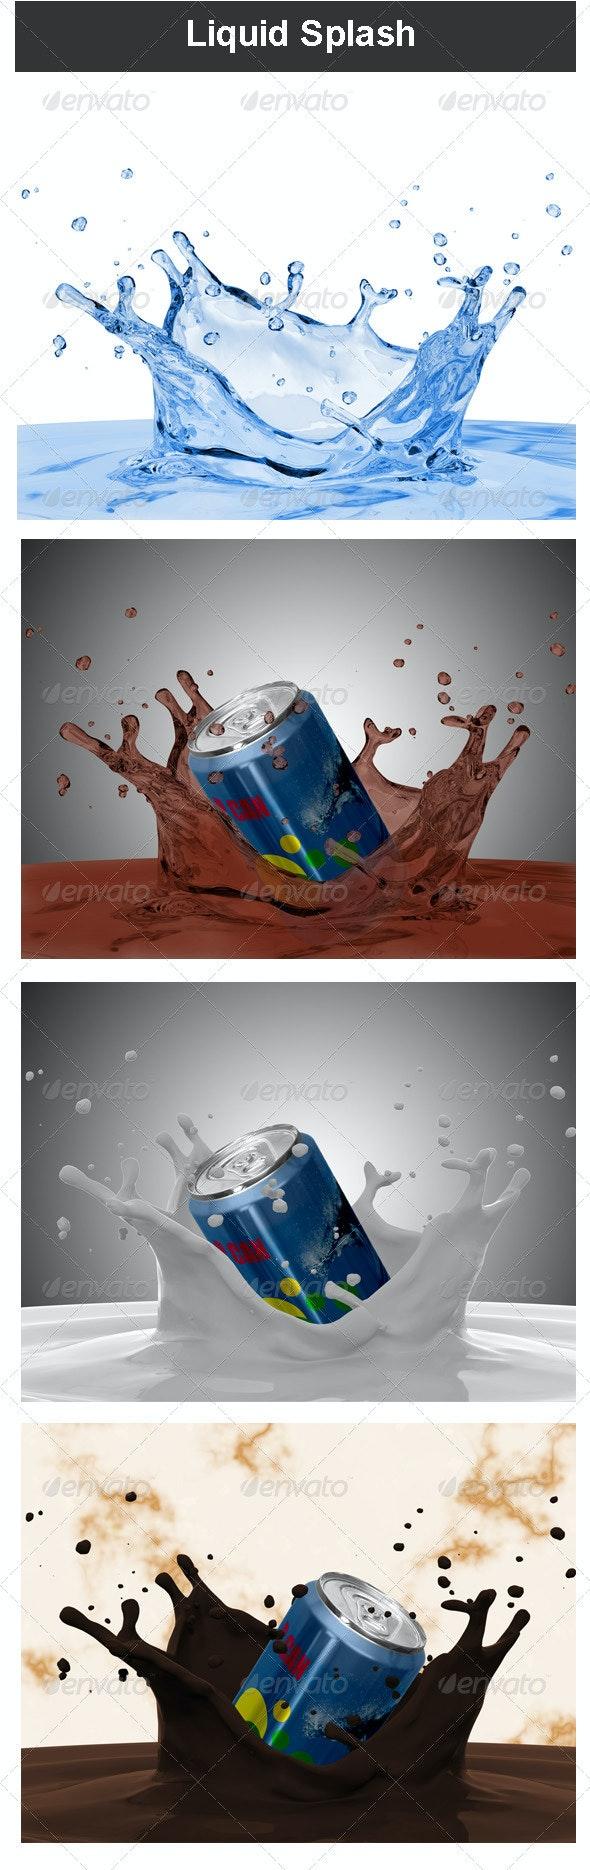 Liquid Splash - Miscellaneous 3D Renders